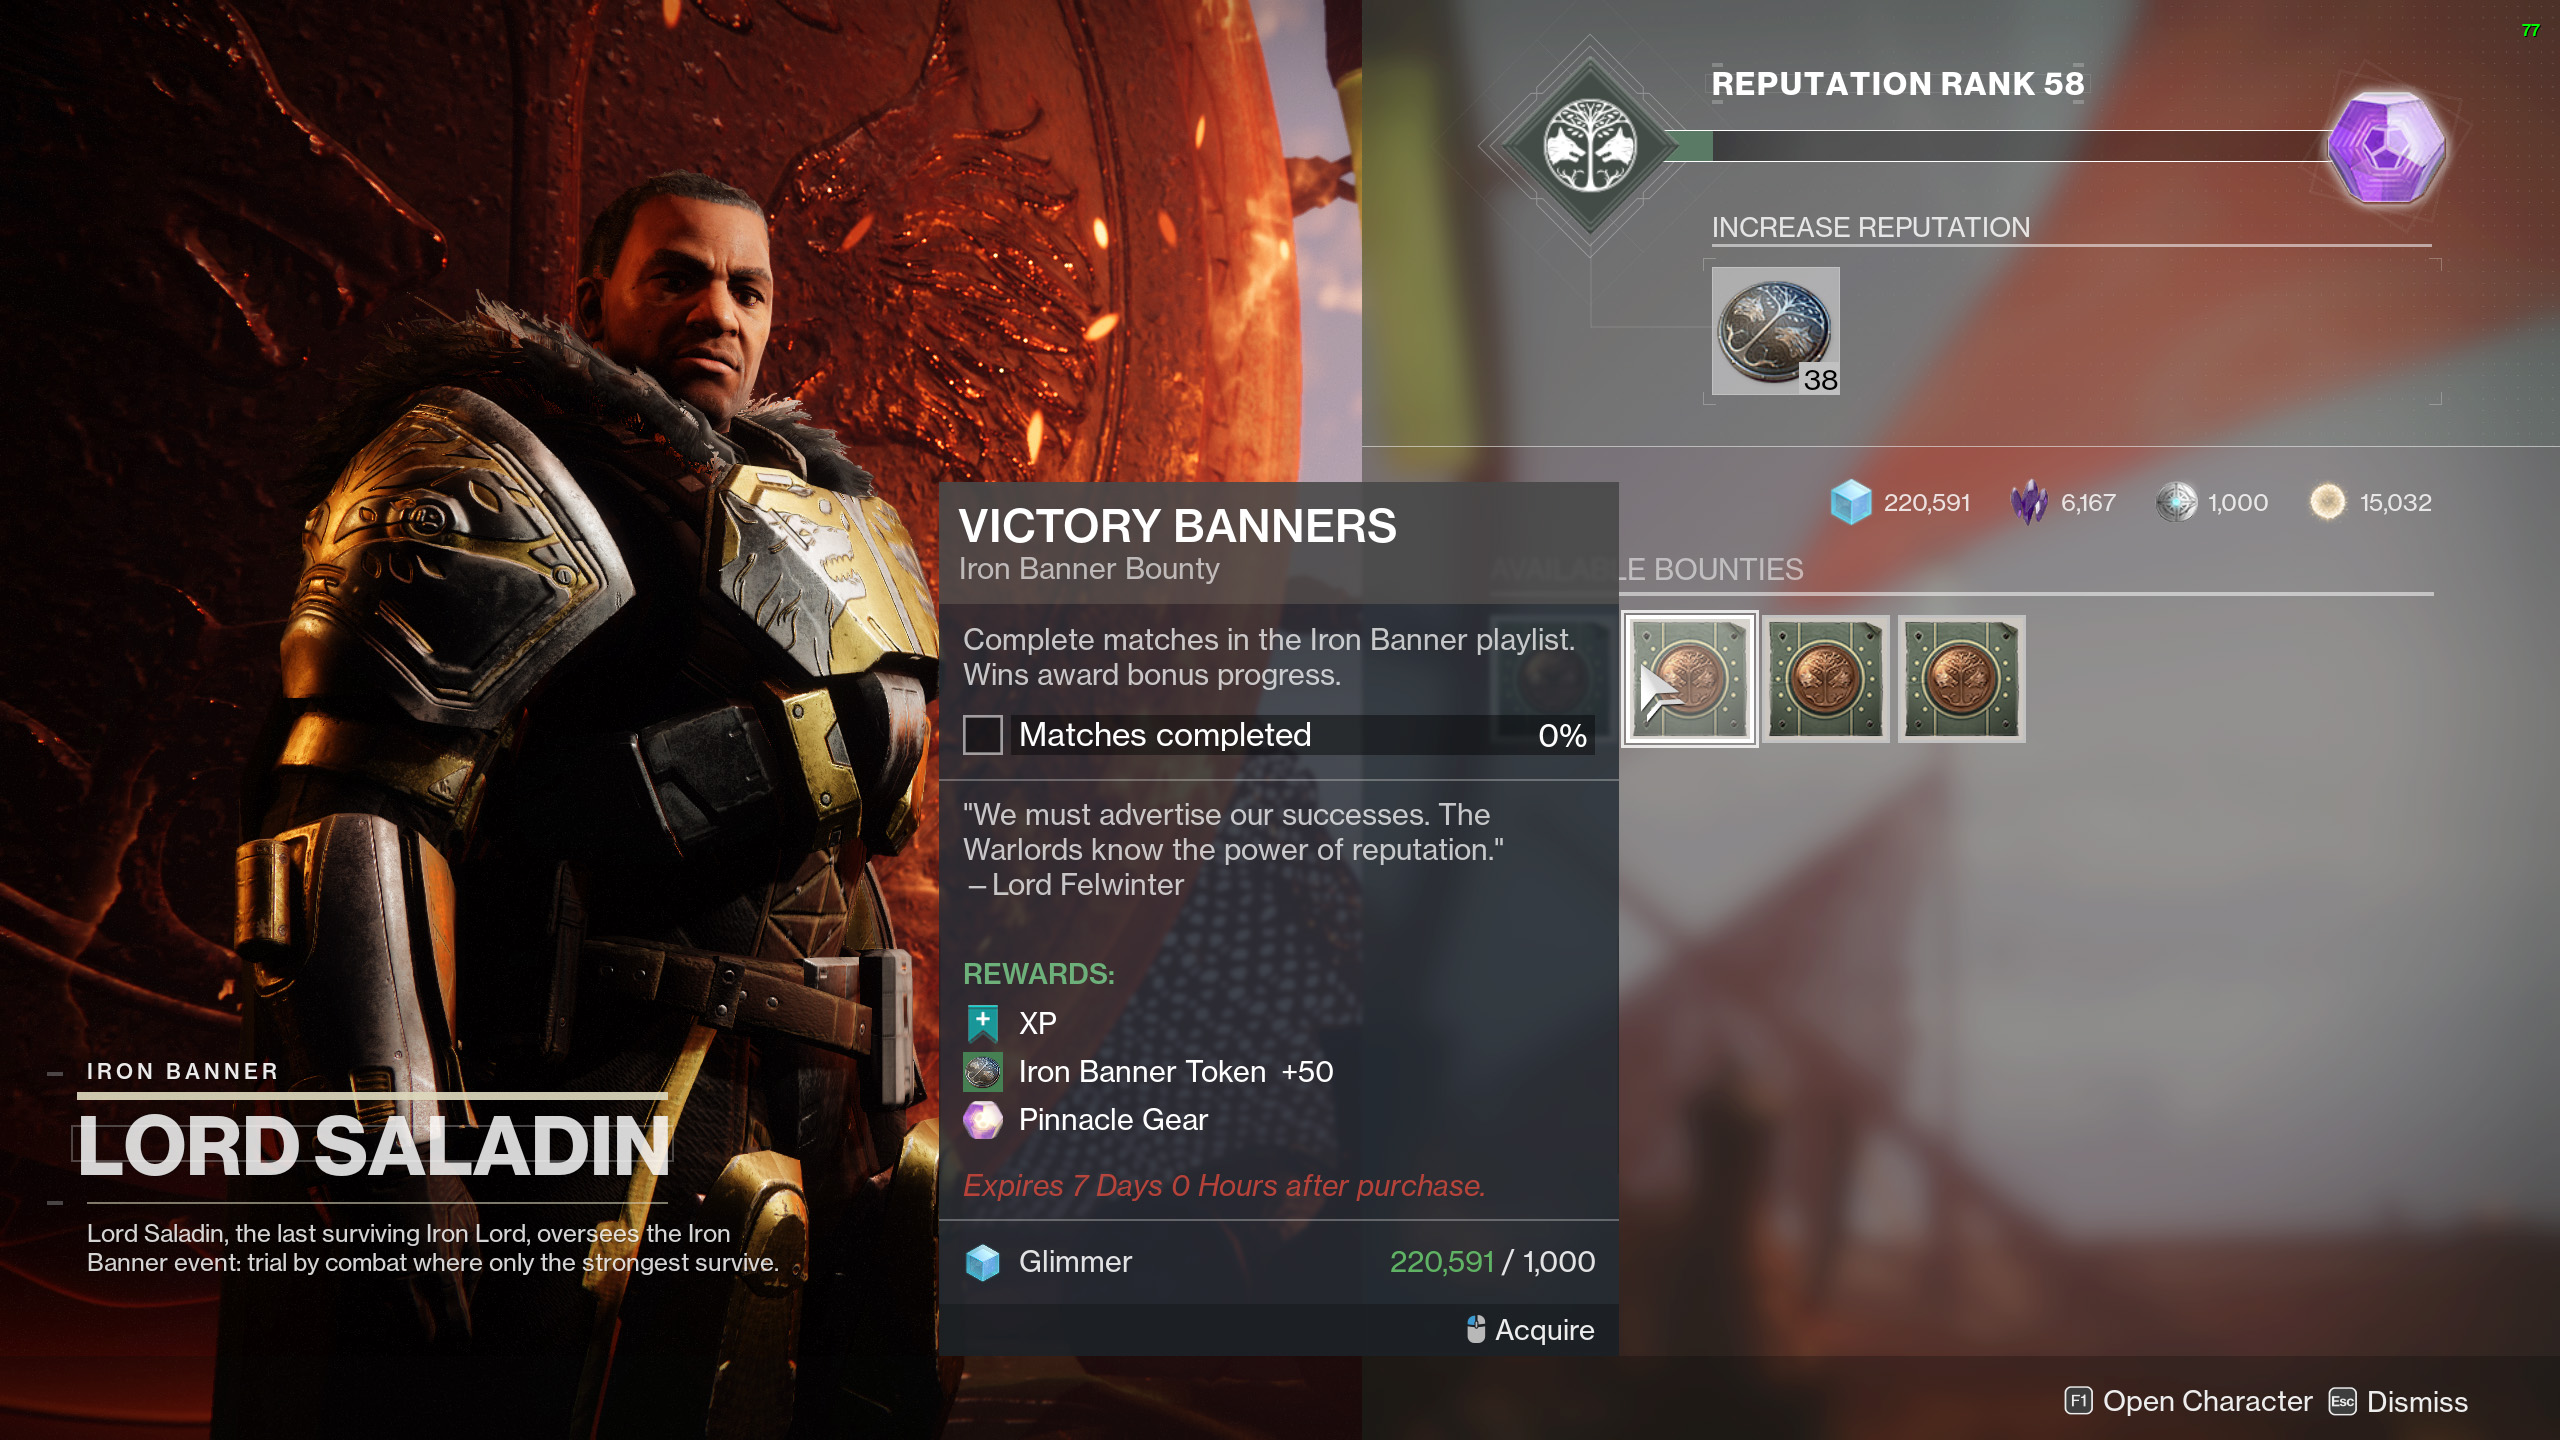 destiny 2 iron banner victory banner bounty